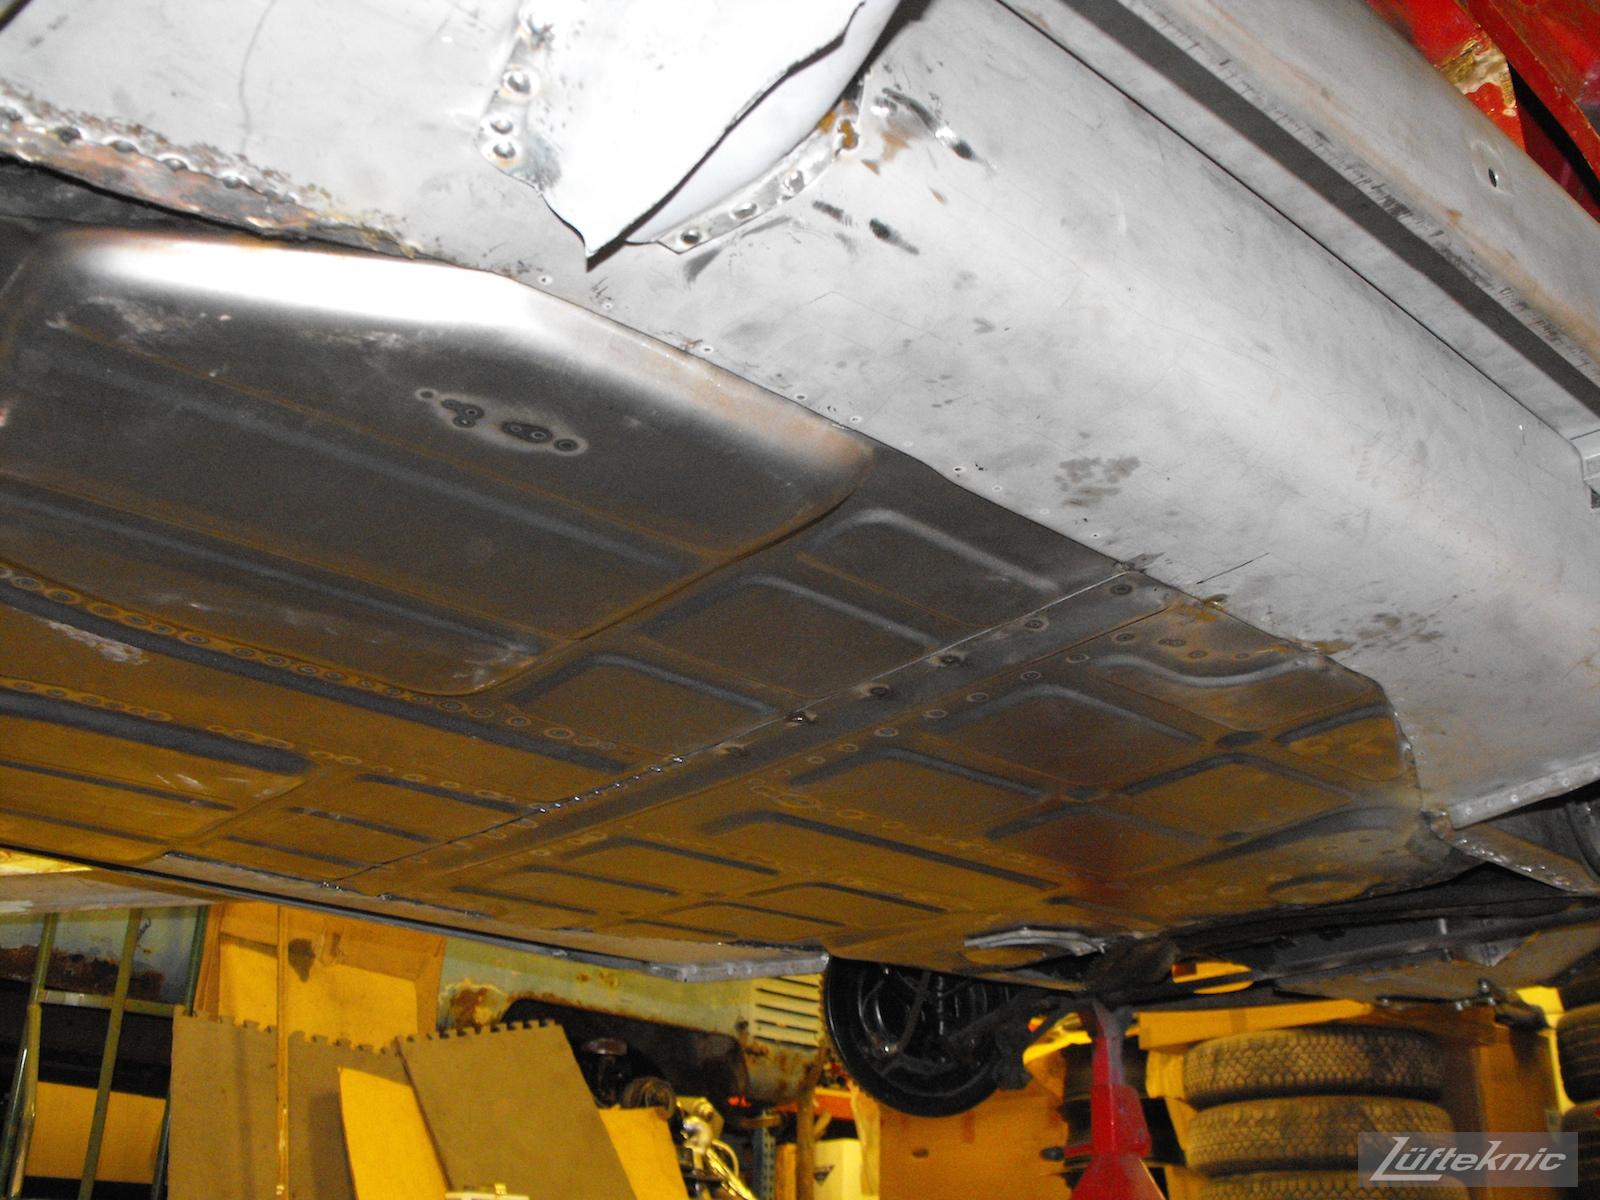 New floors installed into a 1961 Porsche 356B Roadster restoration.